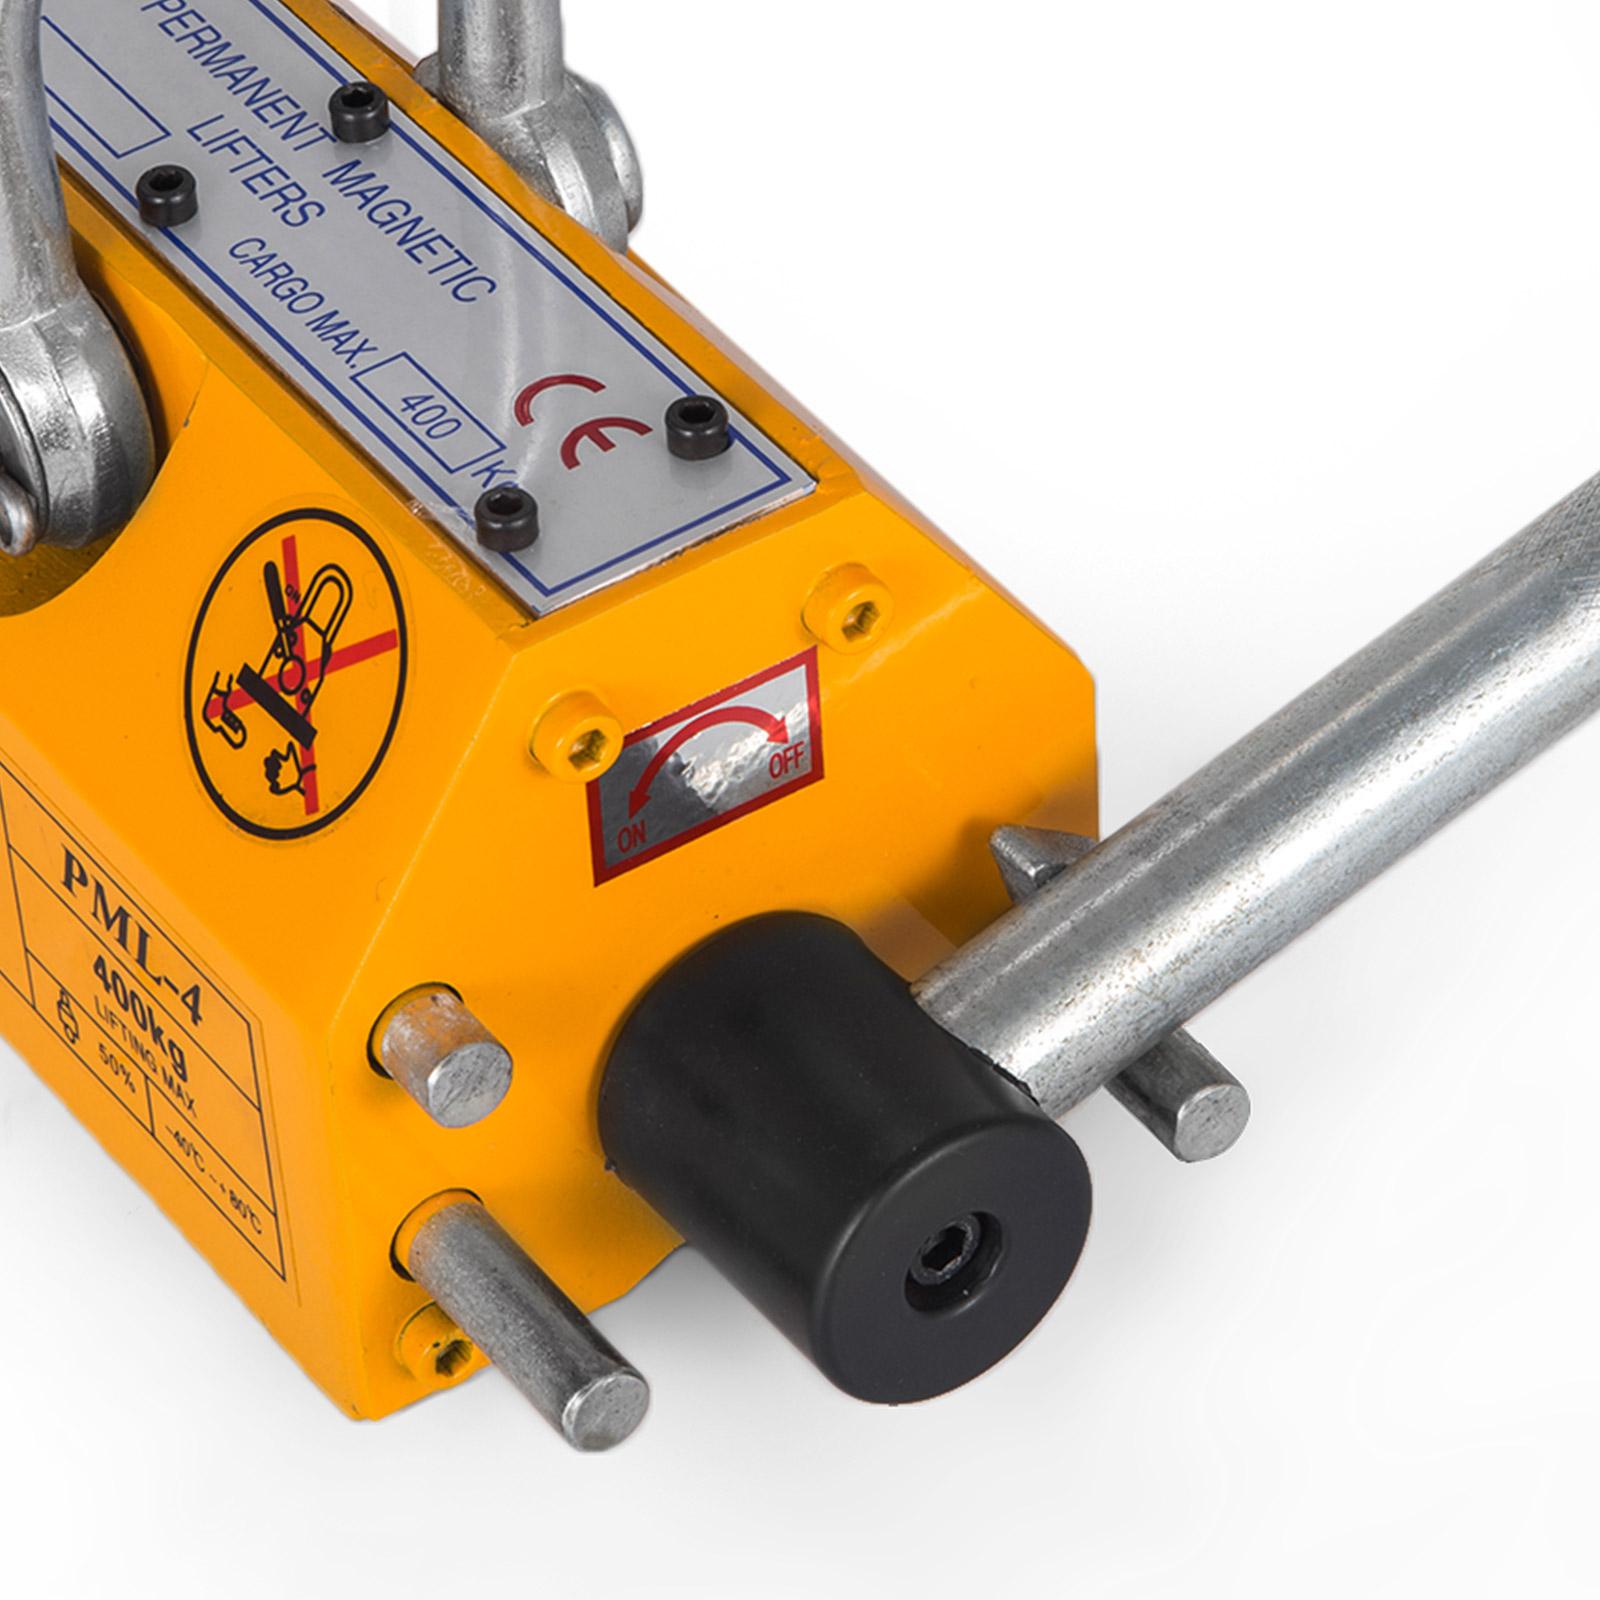 100-300-600-1000KG-Steel-Magnetic-Lifter-Heavy-Duty-Crane-Hoist-Lifting-Magnet miniature 48